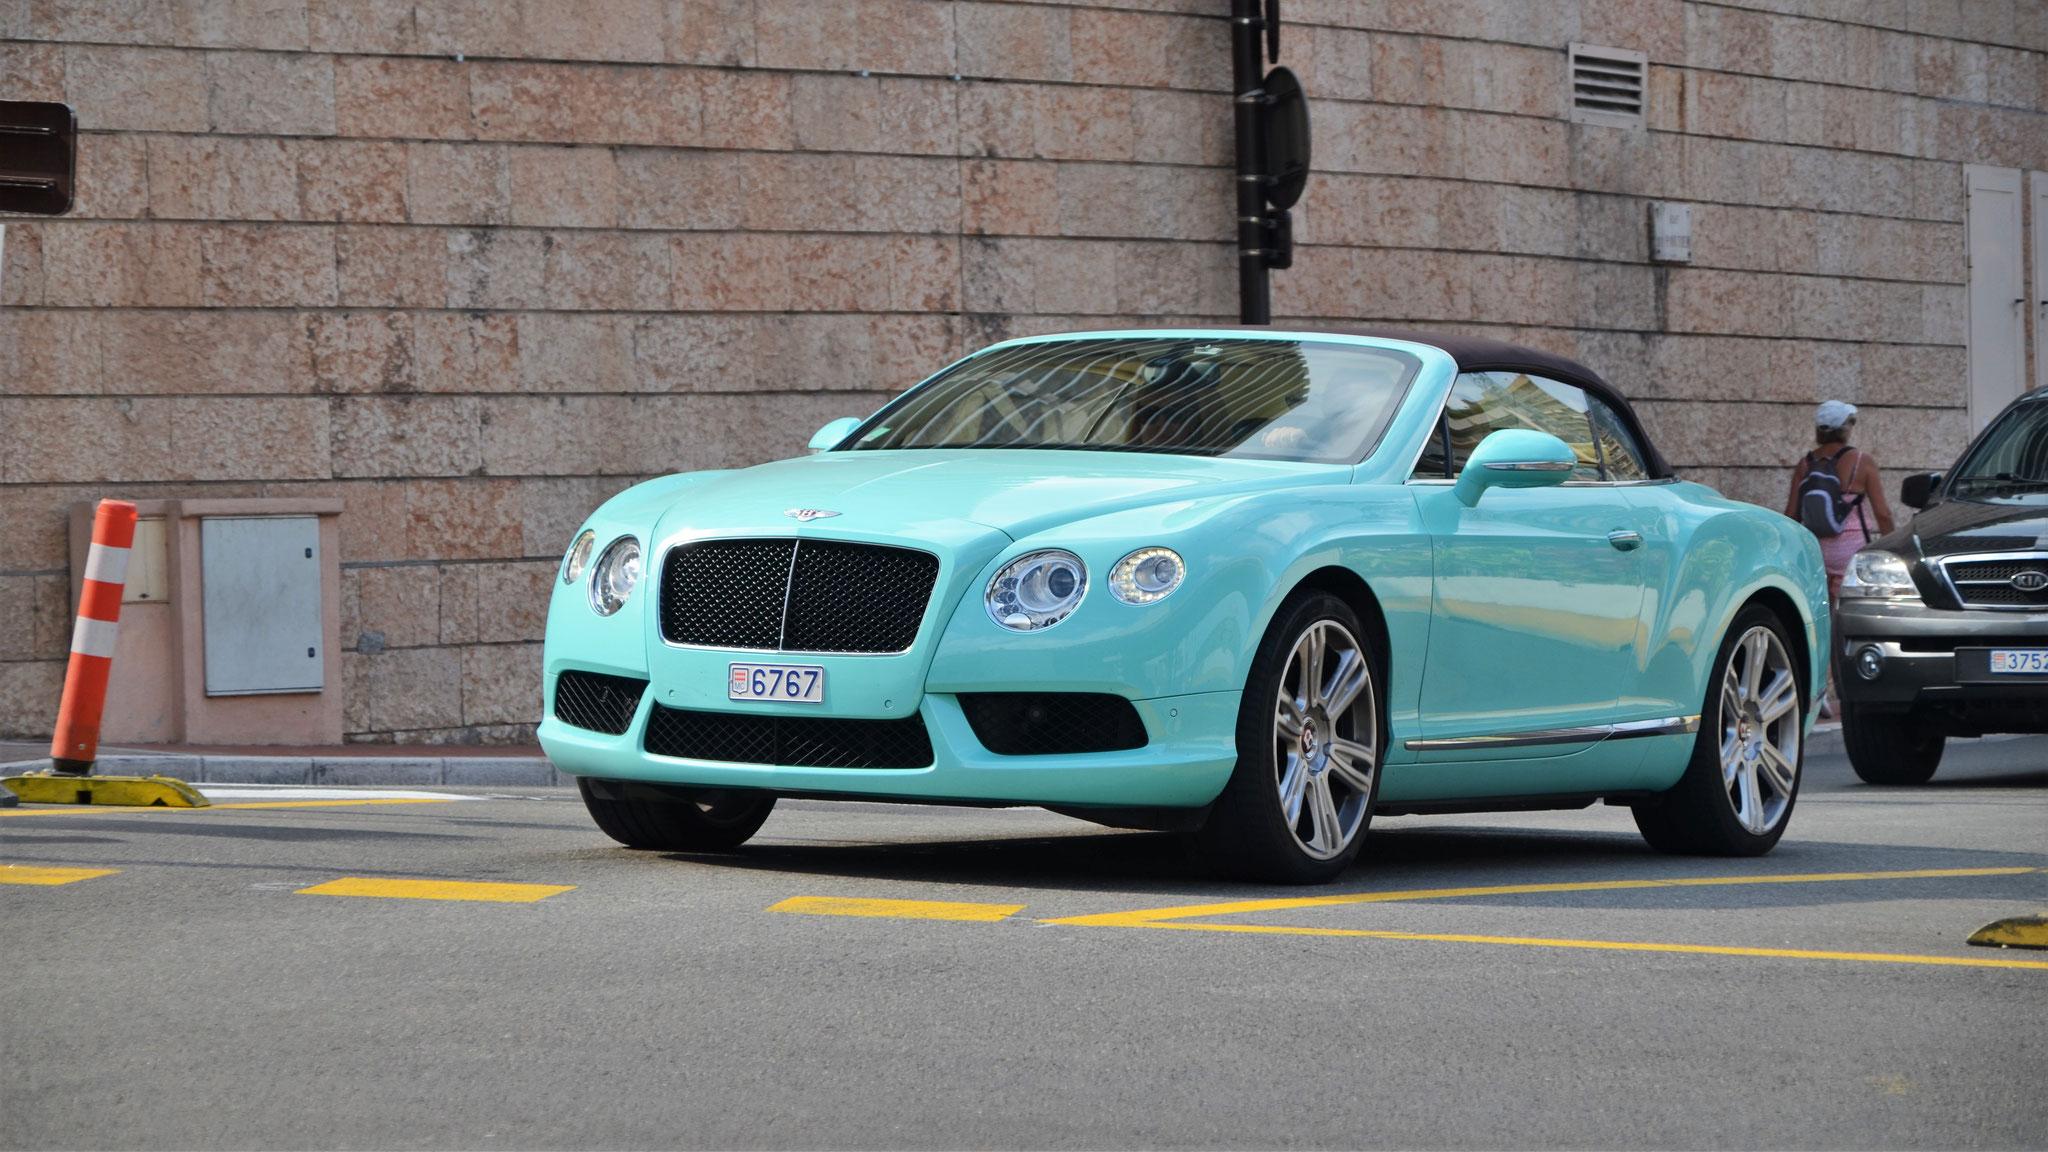 Bentley Continental GTC  - 6767 (MC)